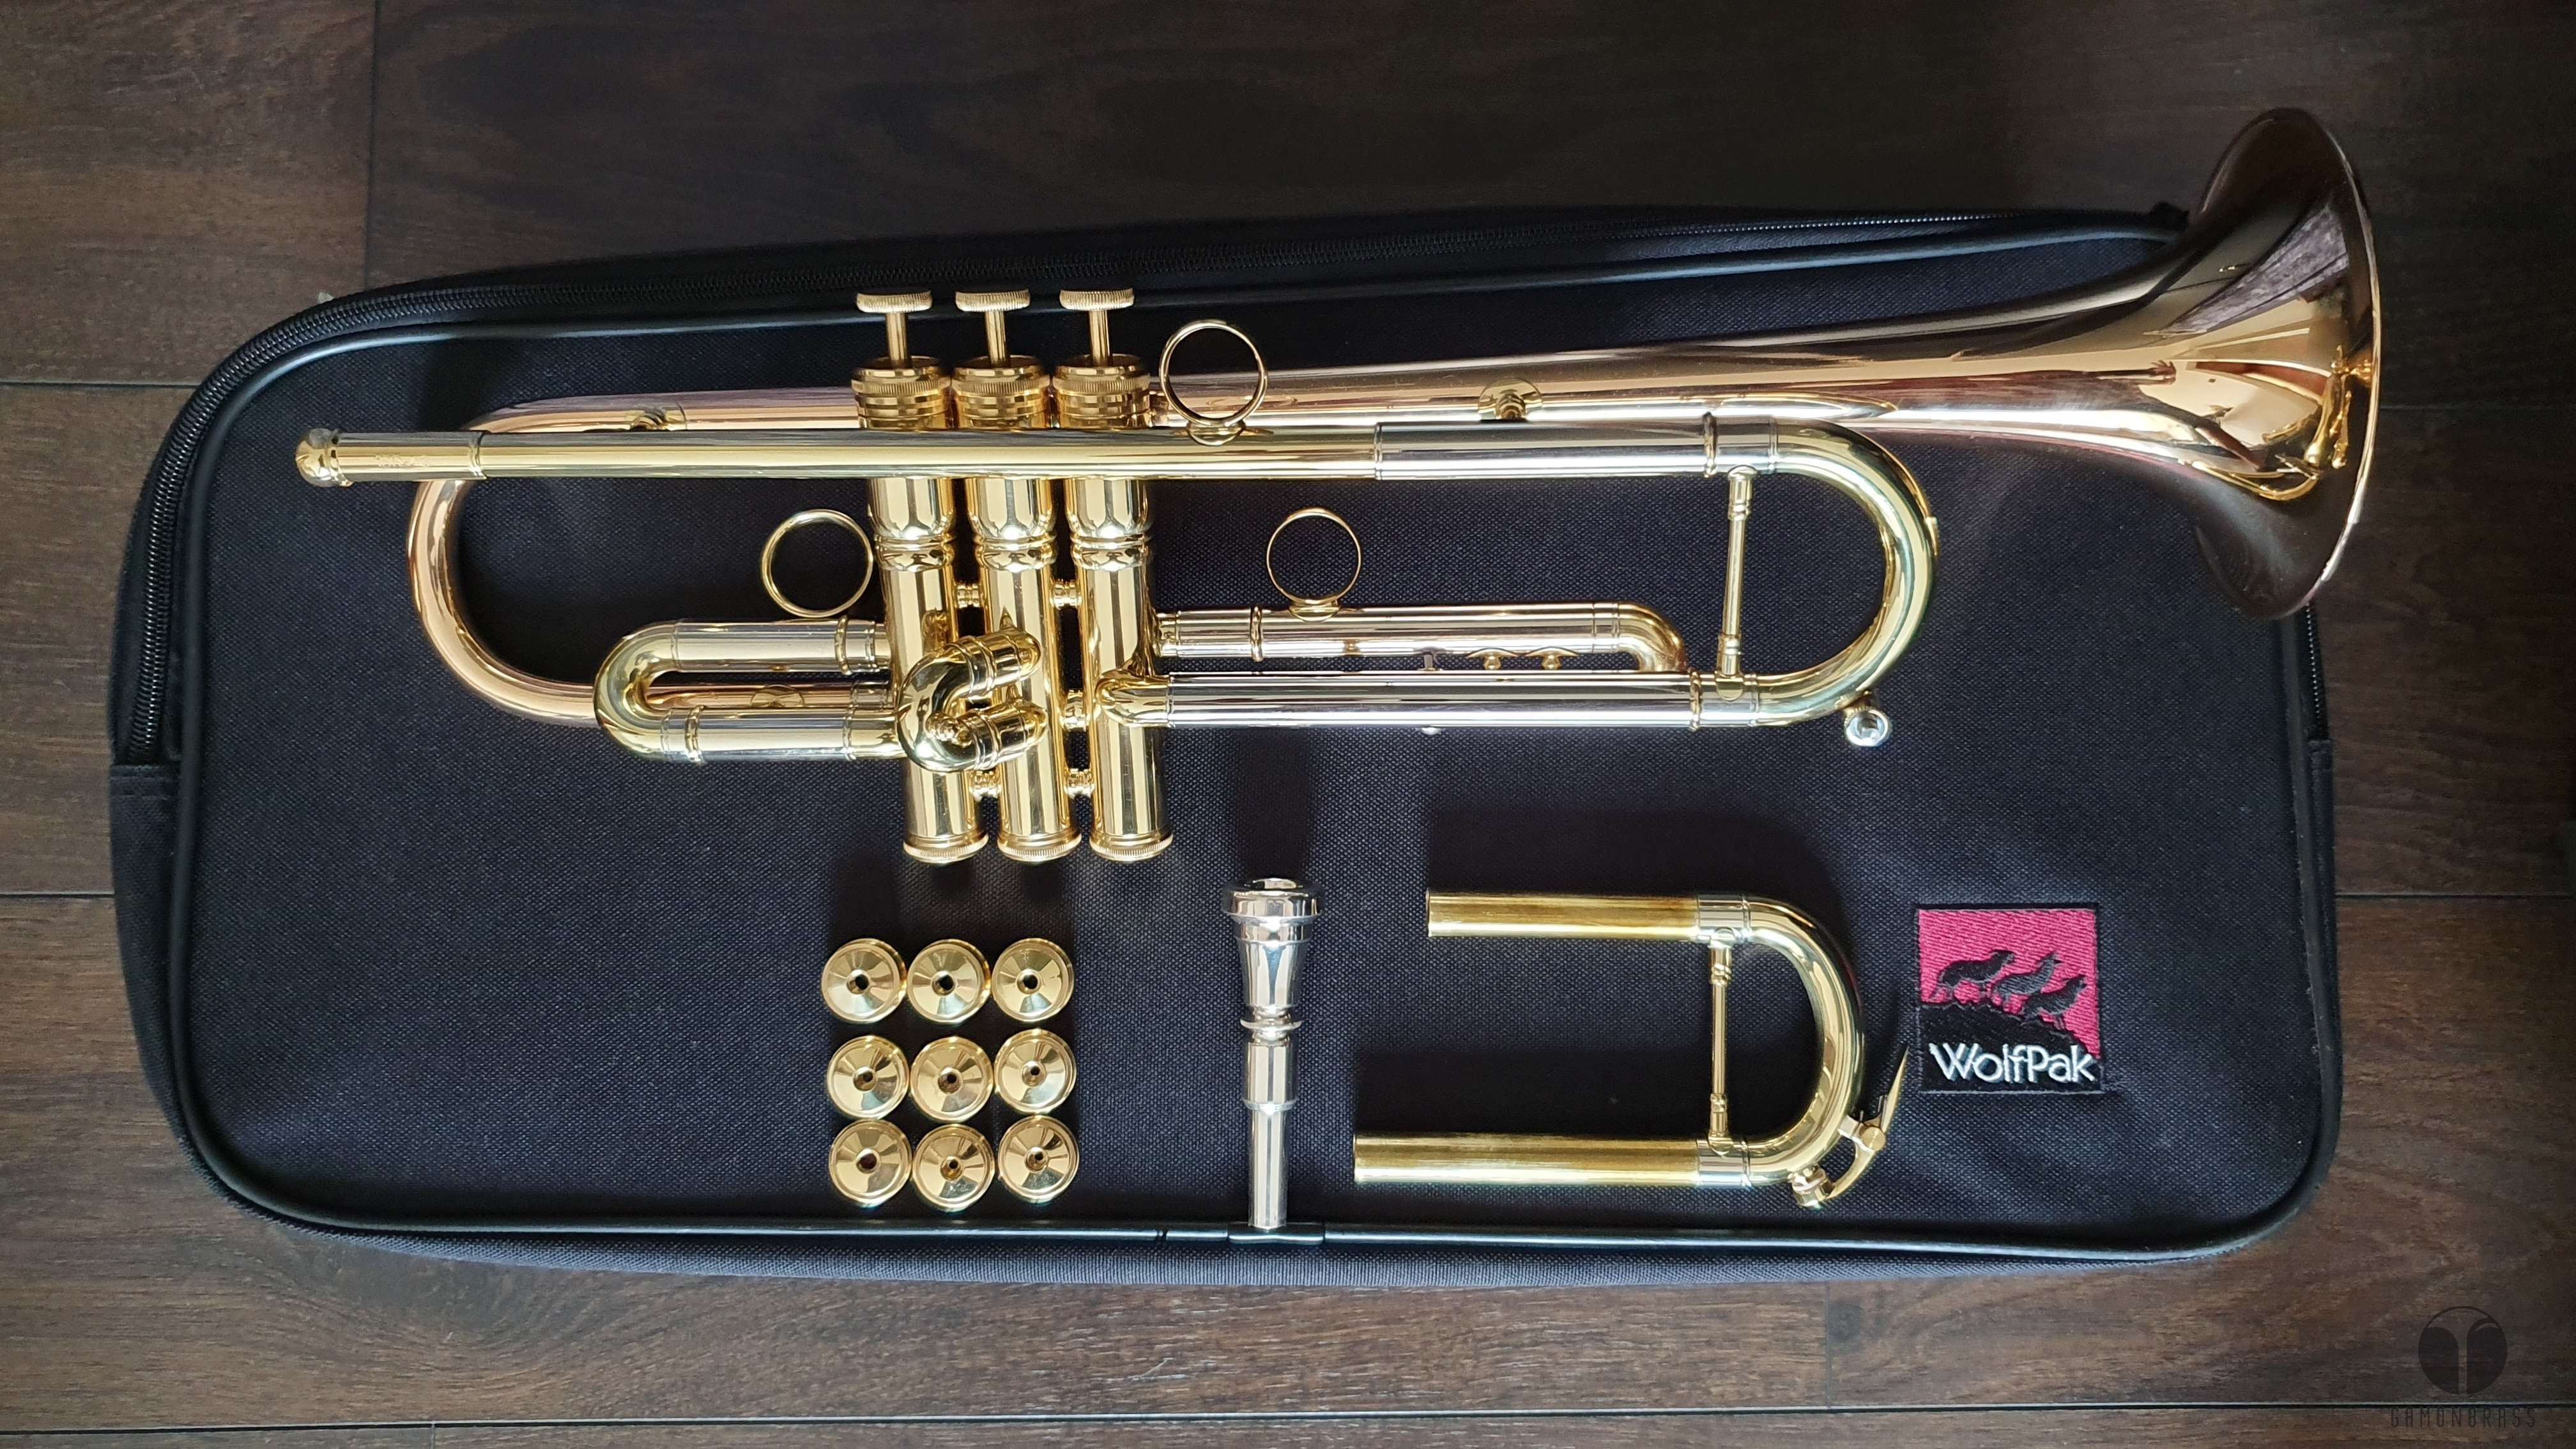 Gamonbrass - Finest high brass instruments